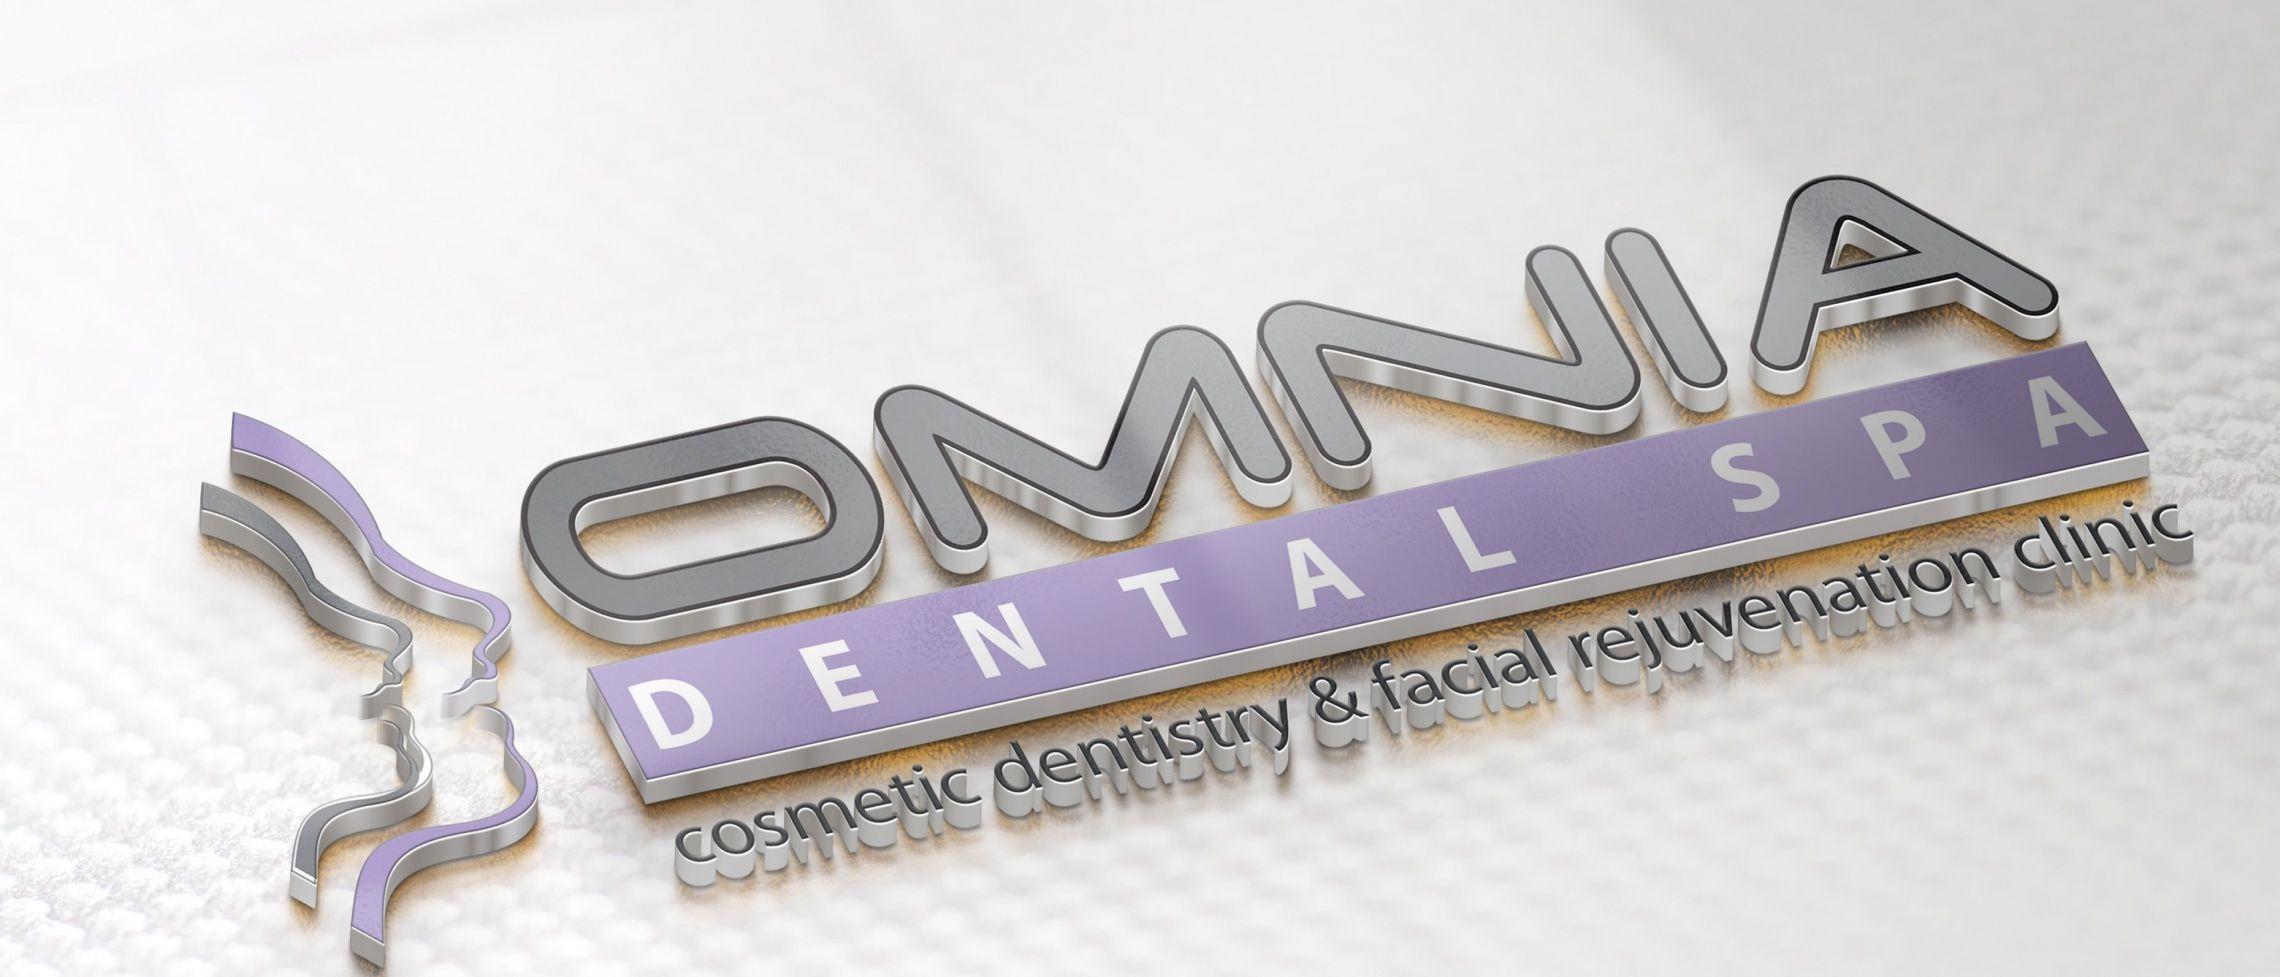 Omnia Dental Spa - Cosmetic Dentistry, Orthodontics & Facial Rejuvenation